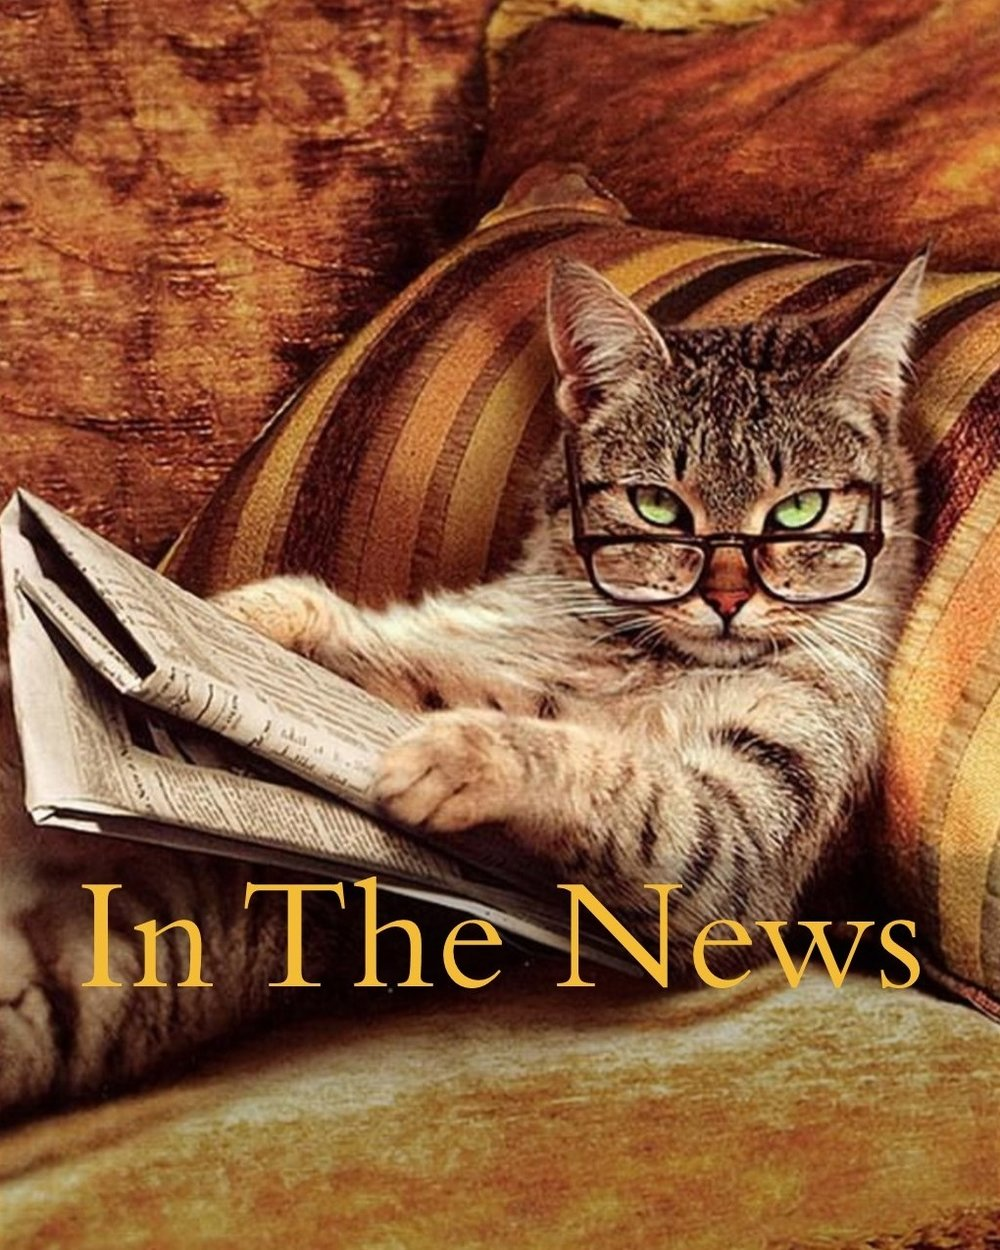 Cat+reading+newspaper